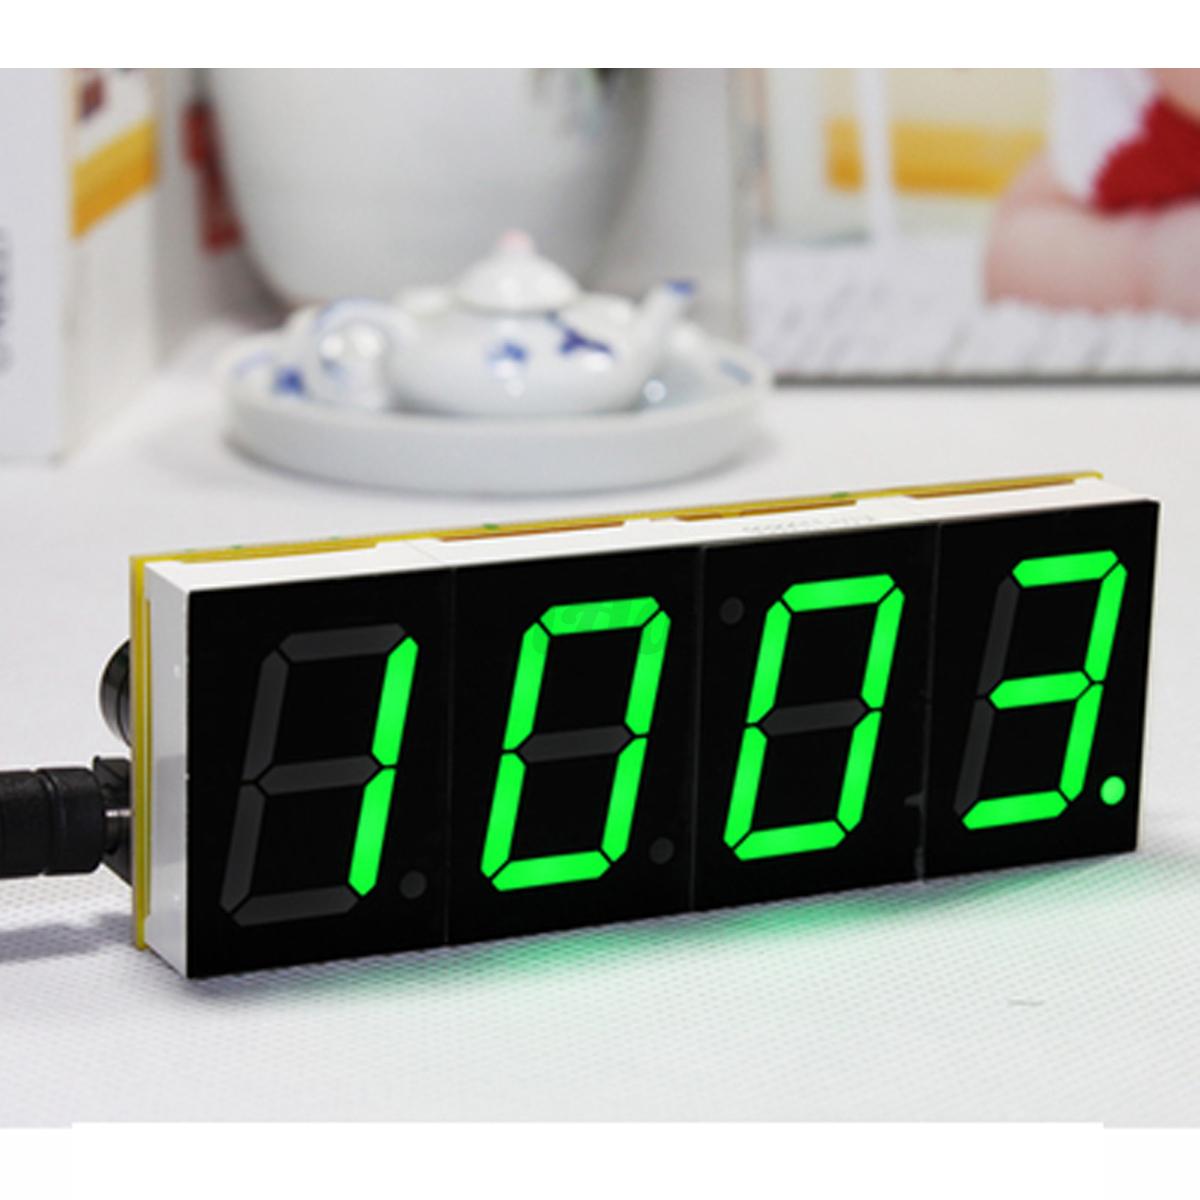 digital led electronic microcontroller clock kit large screen display time new ebay. Black Bedroom Furniture Sets. Home Design Ideas